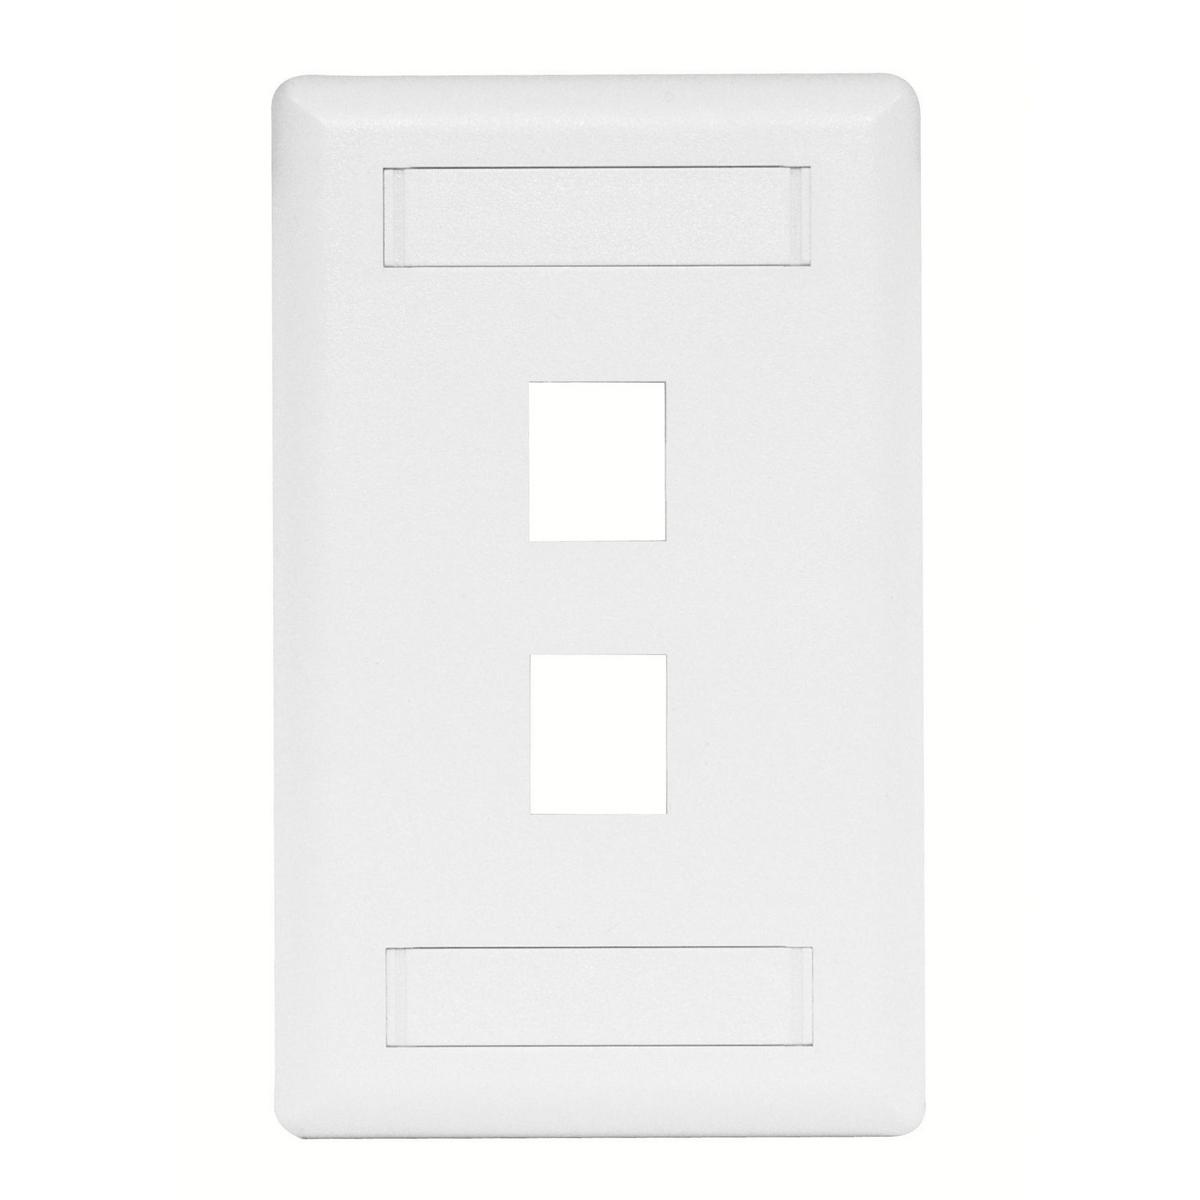 Wiring Device-Kellems IFP12W